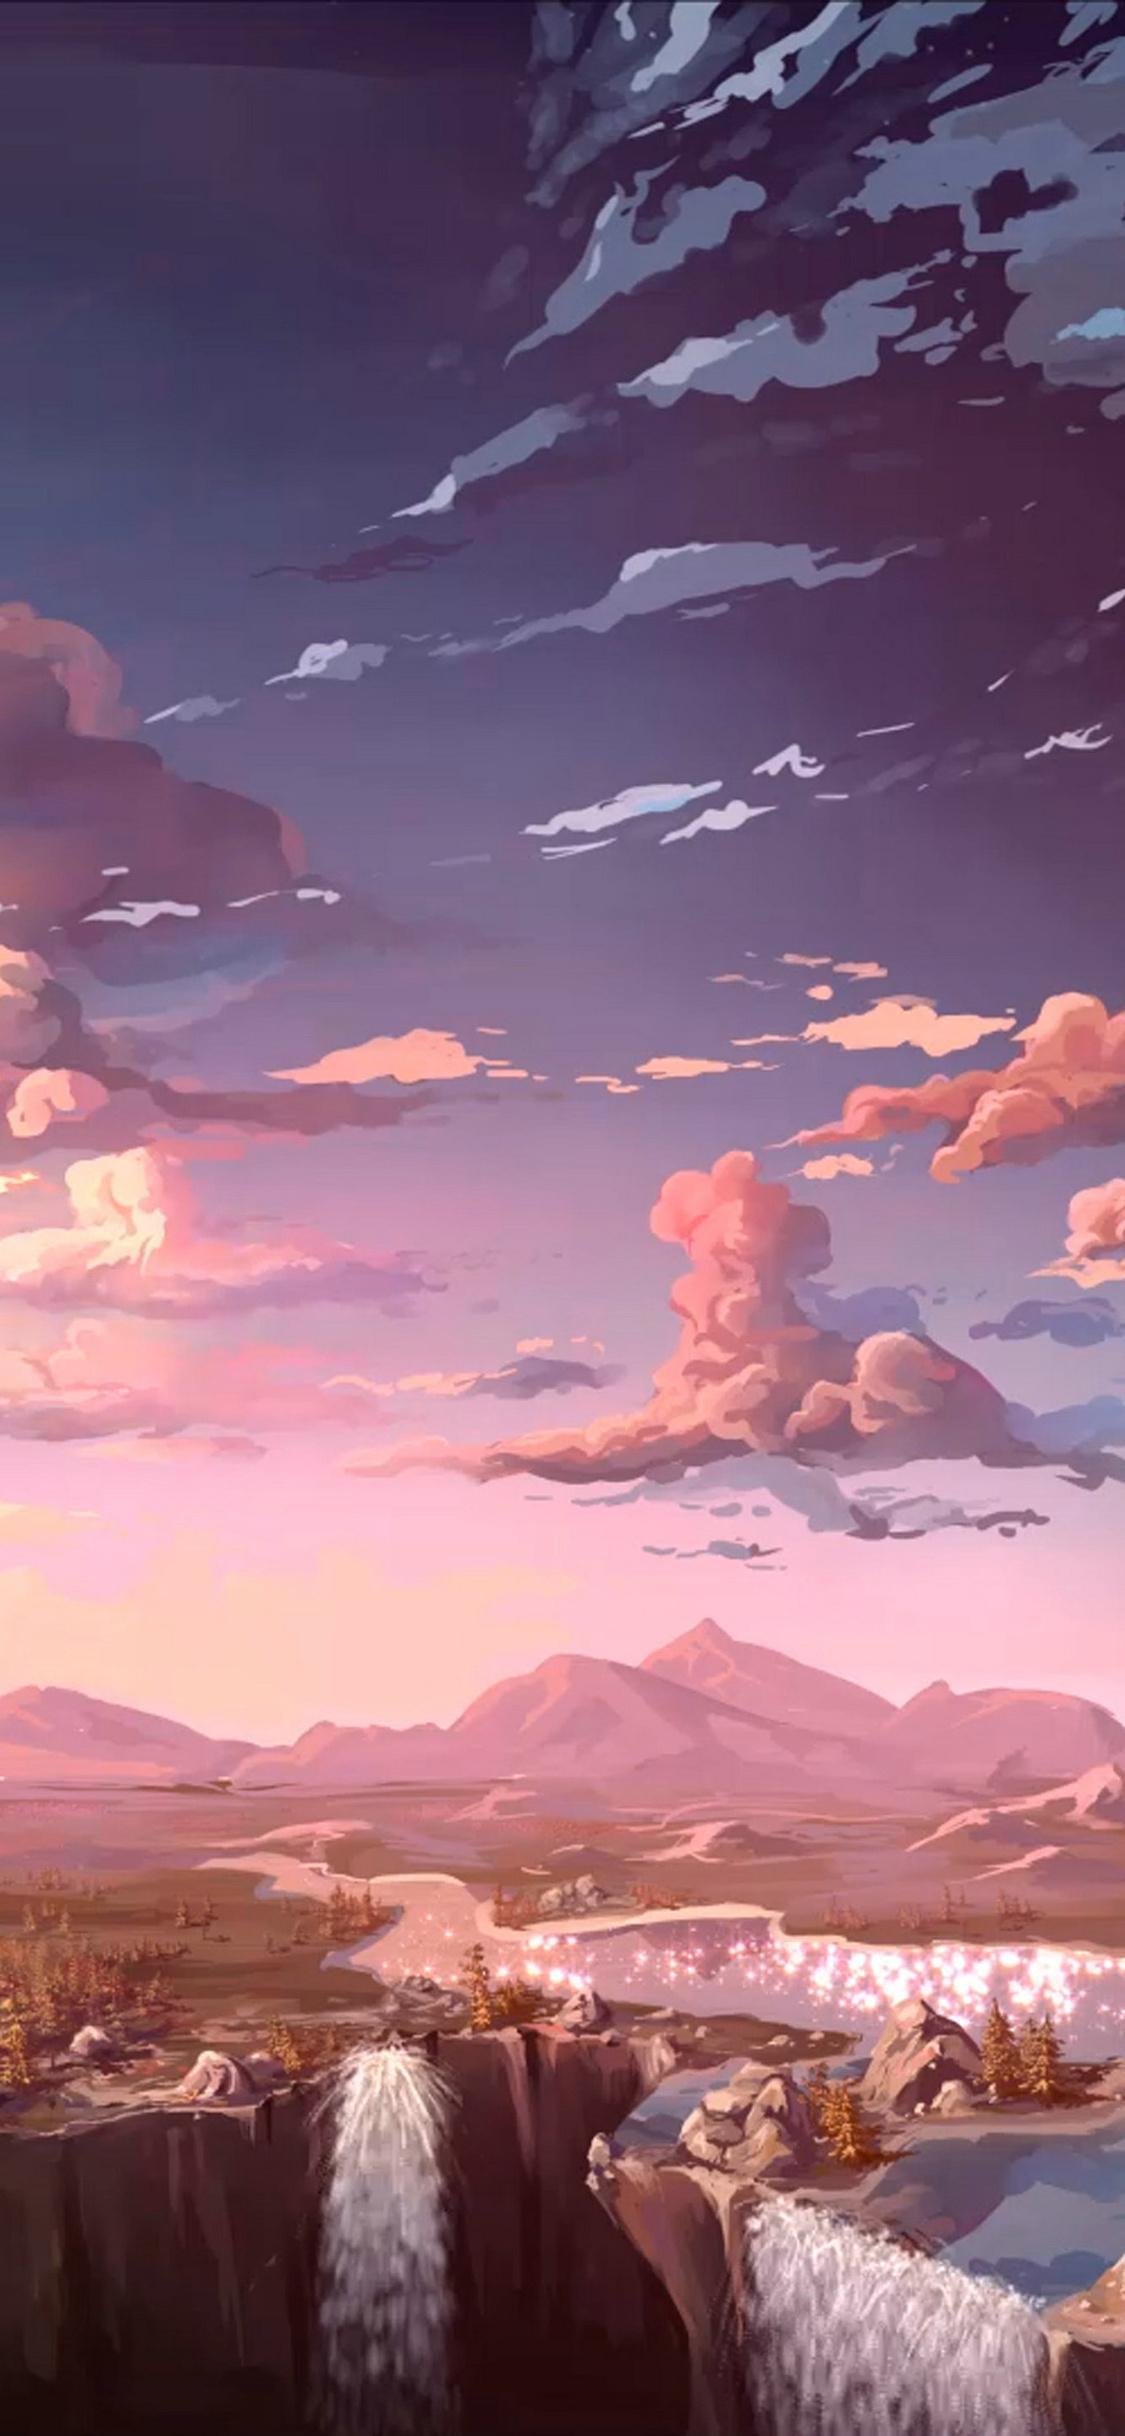 1125x2436 Anime Landscape Waterfall Cloud 5k Iphone XS ...